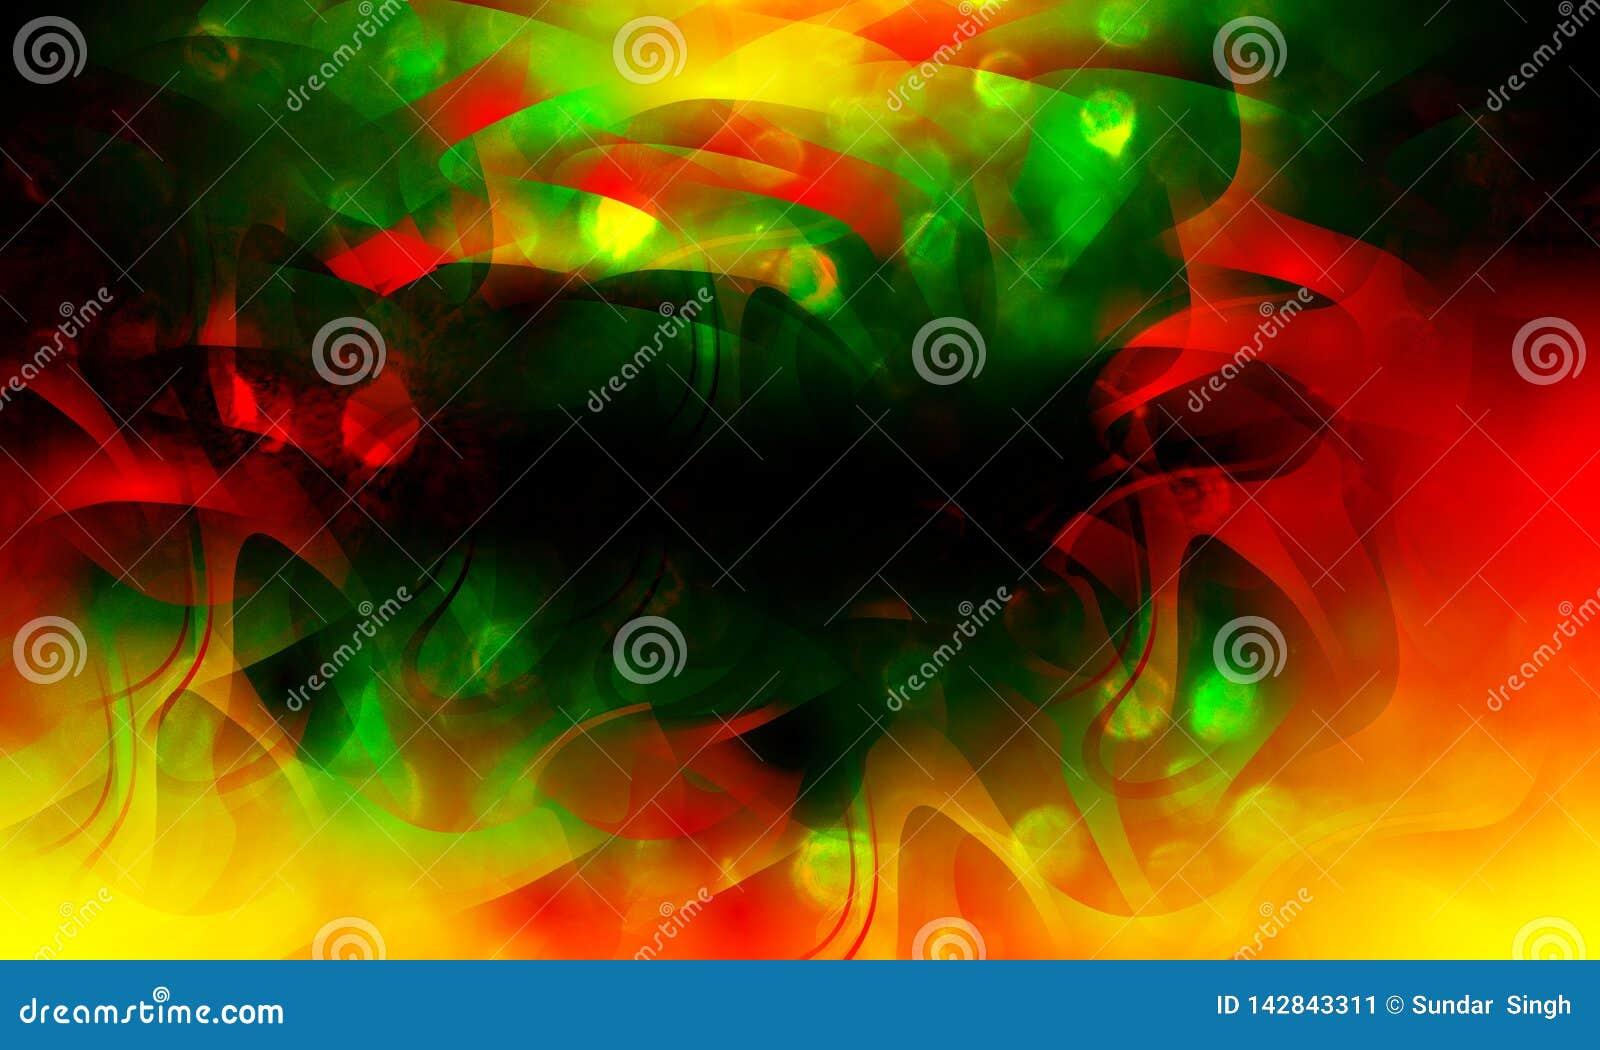 Fundo colorido abstrato da onda, faísca mágica do Natal, pontos claros, efeito quebrado do vetor Papel de parede do fundo